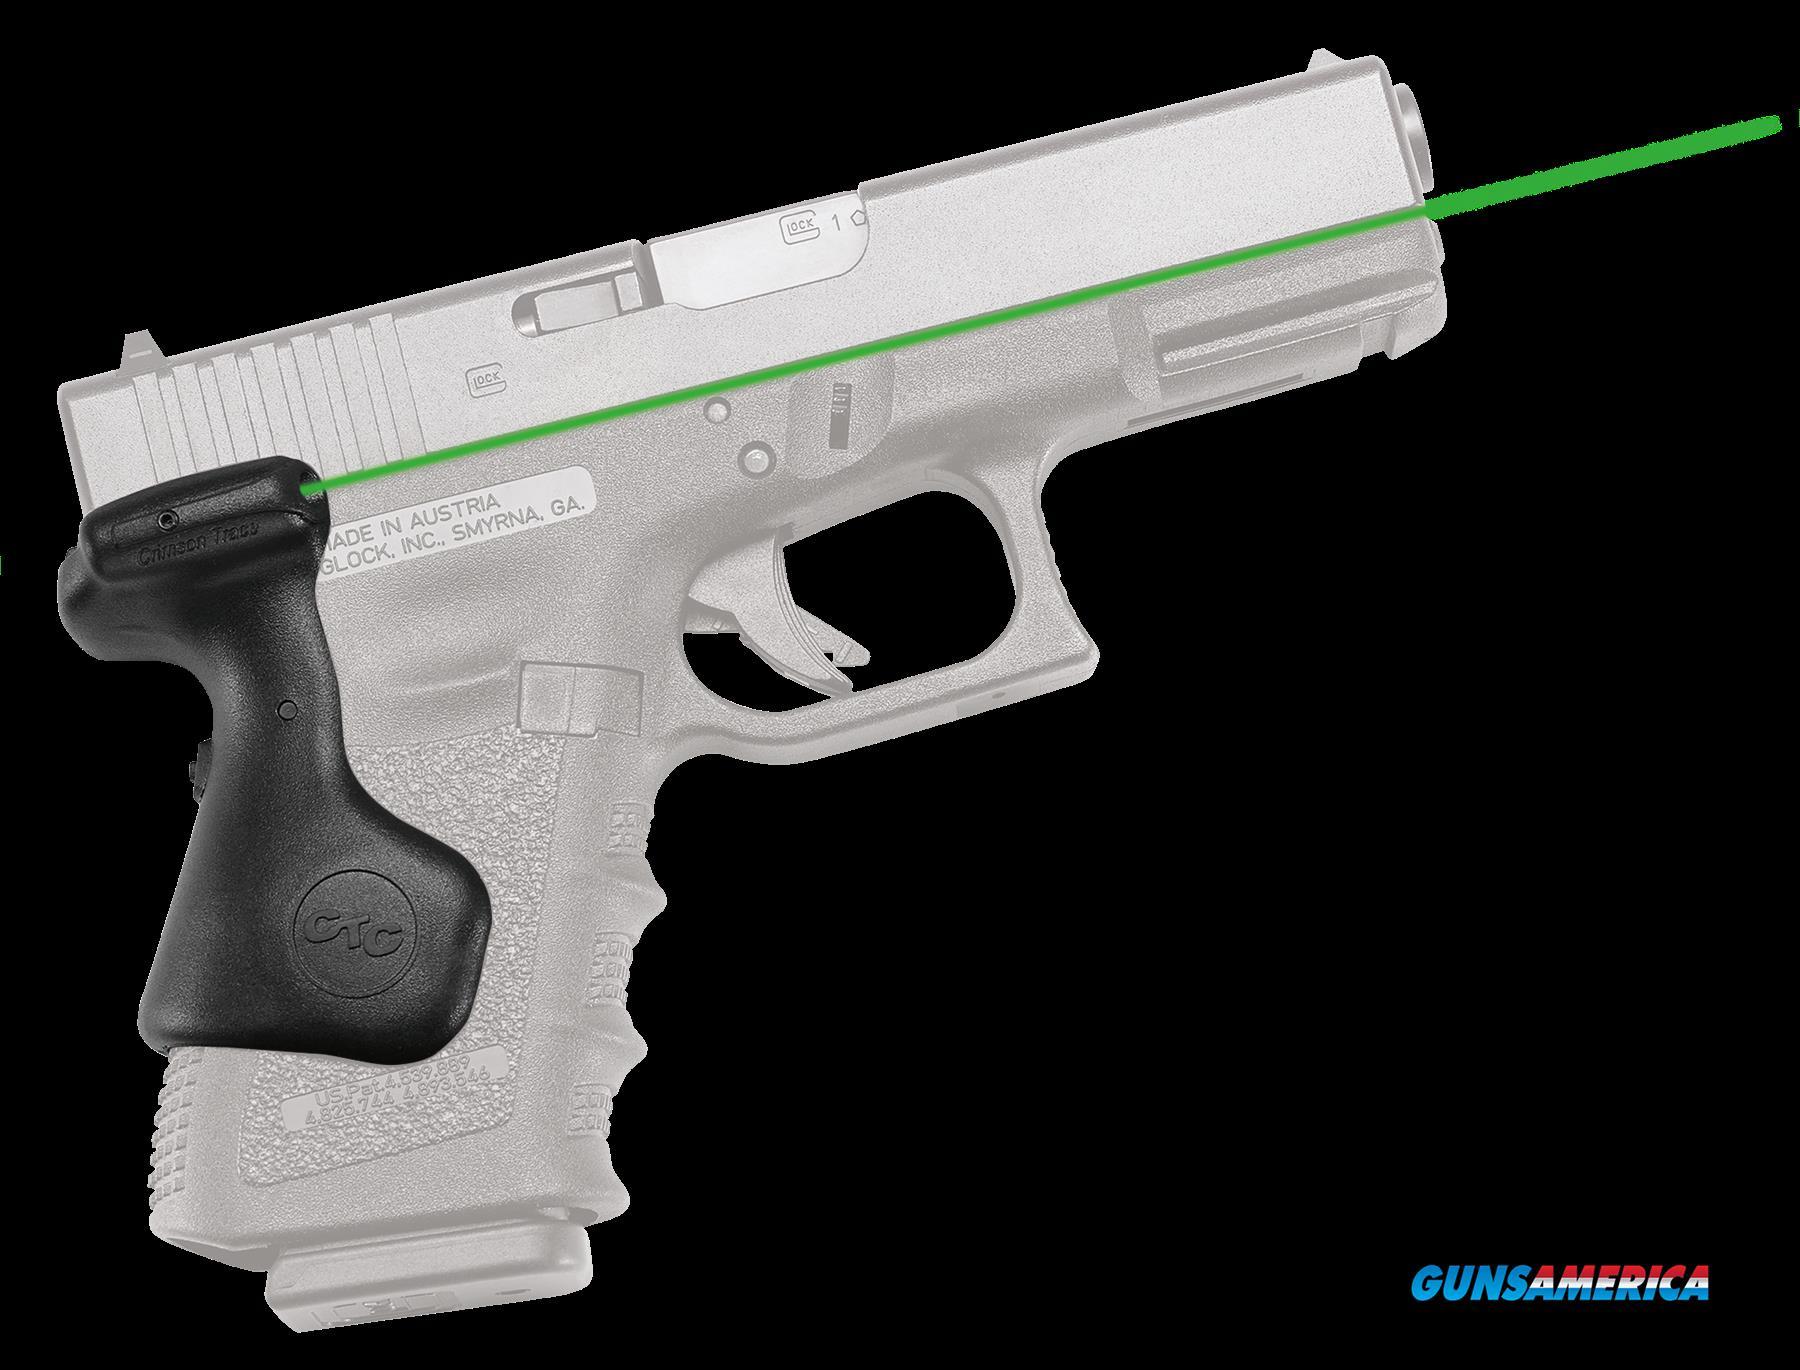 Crimson Trace Lasergrips, Crim Lg639g   Grips Glk G3 19-23 Gr  Guns > Pistols > 1911 Pistol Copies (non-Colt)